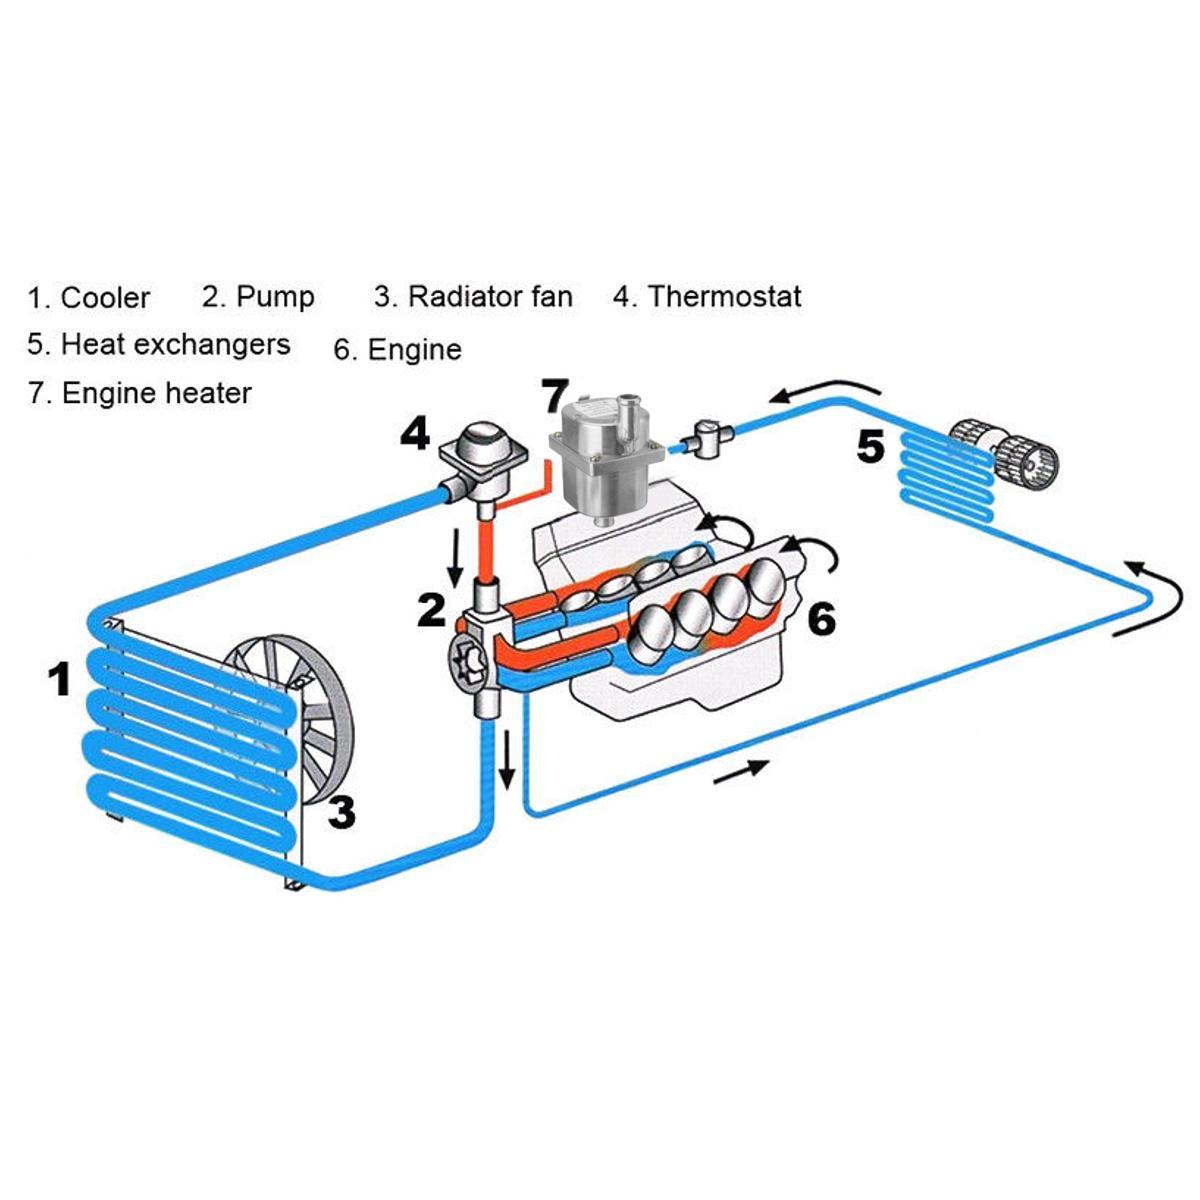 small resolution of 3000w car engine coolant heater preheater not w ebasto eberspacher motor heating preheating air parking heater in heating fans from automobiles